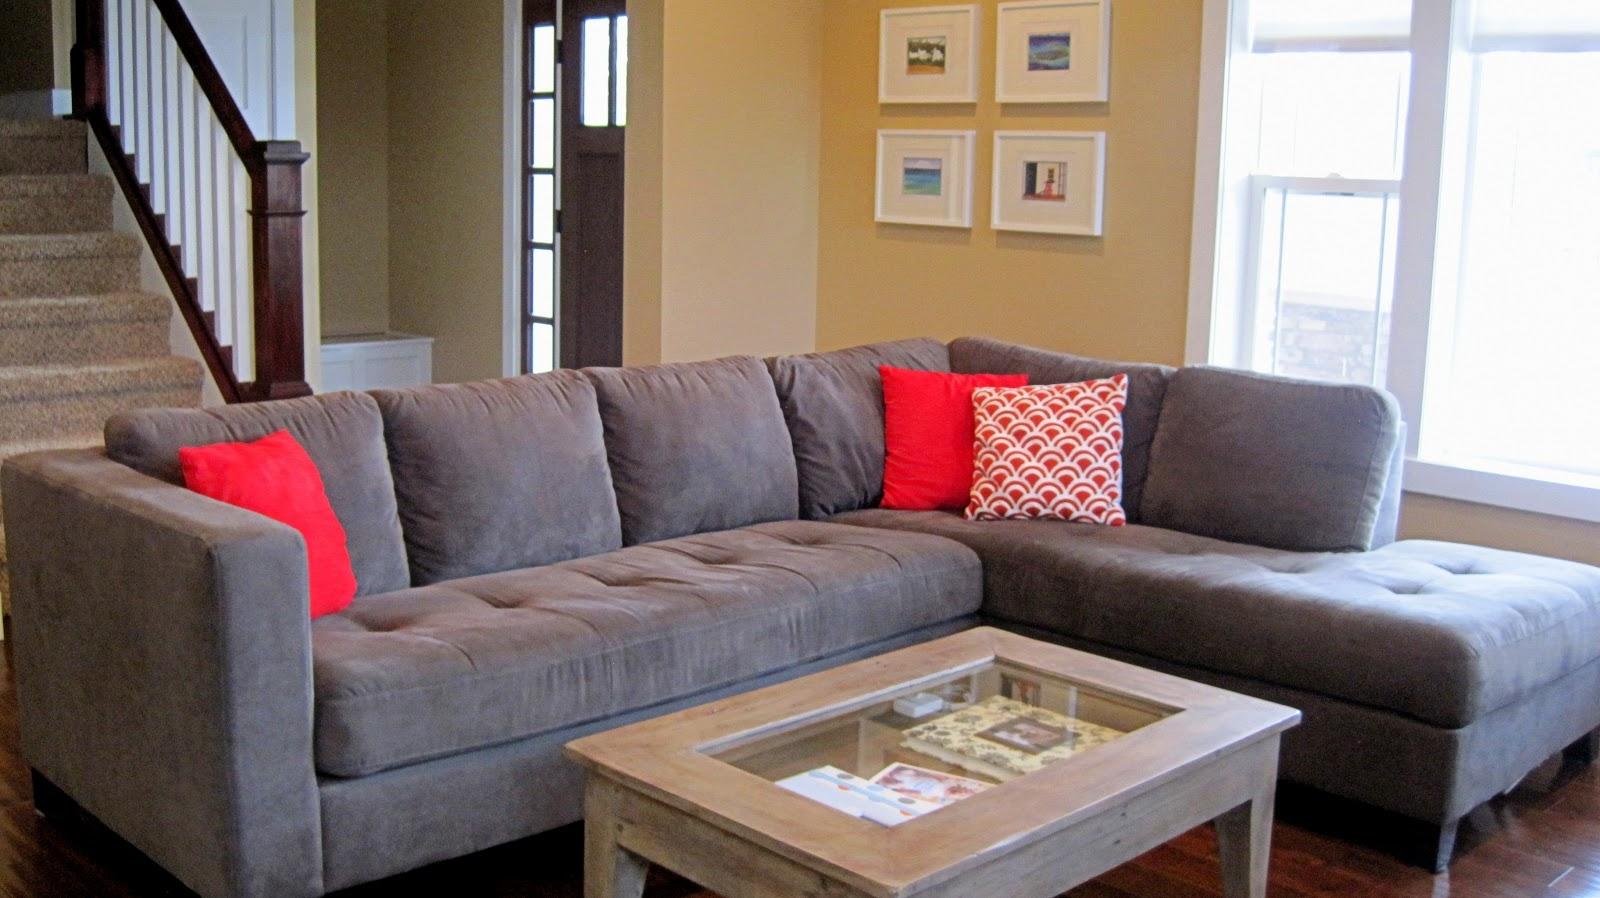 sofa lounge for living room livingroom:home designs chaise lounge chairs for living room ideas with sofa  leather ALOJCZQ